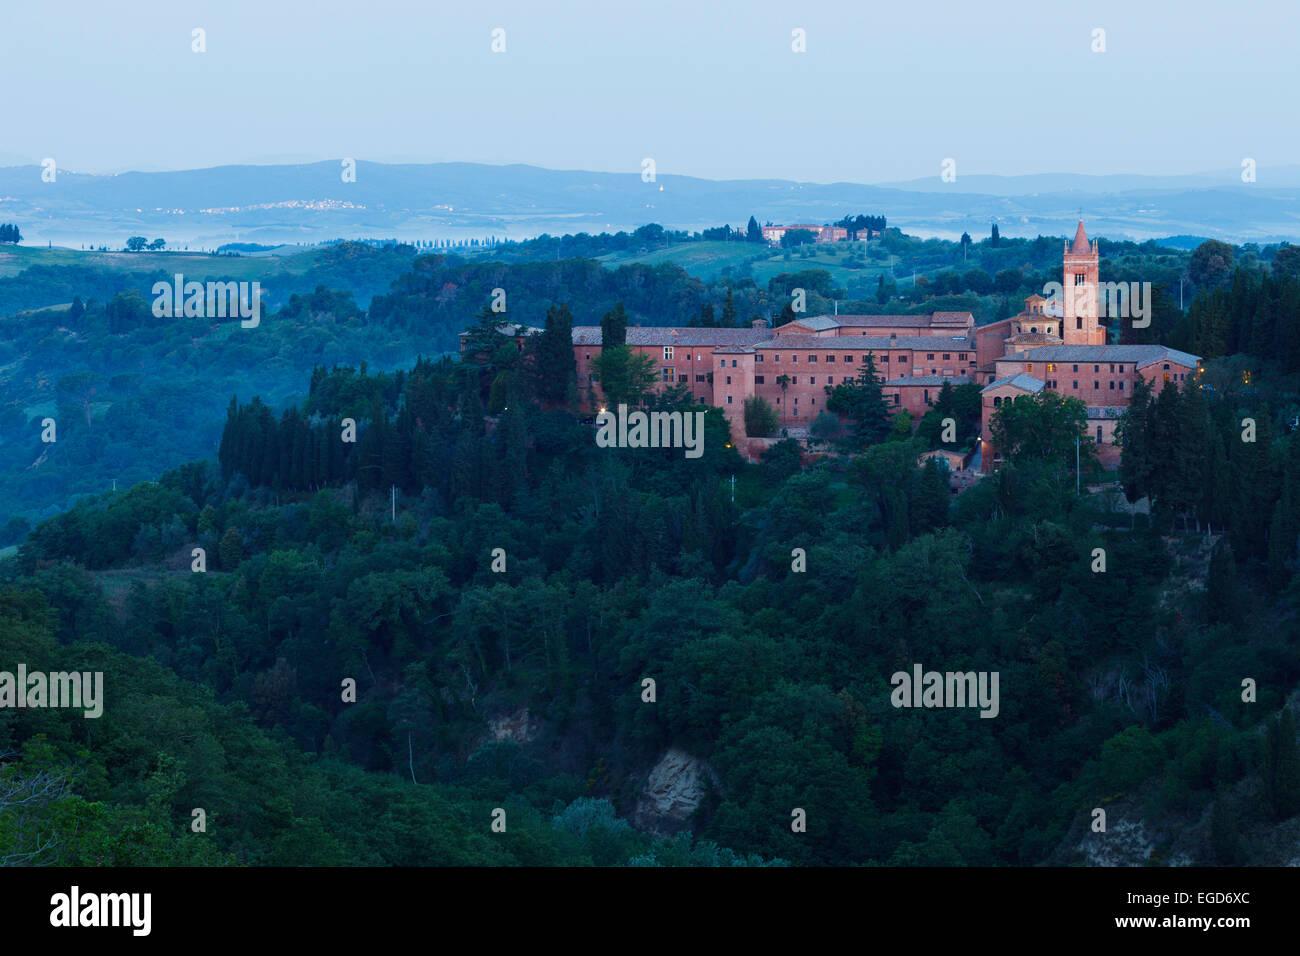 Abbaye de Monte Oliveto Maggiore monastère bénédictin, près de Asciano, Val d'Orcia, Val Photo Stock